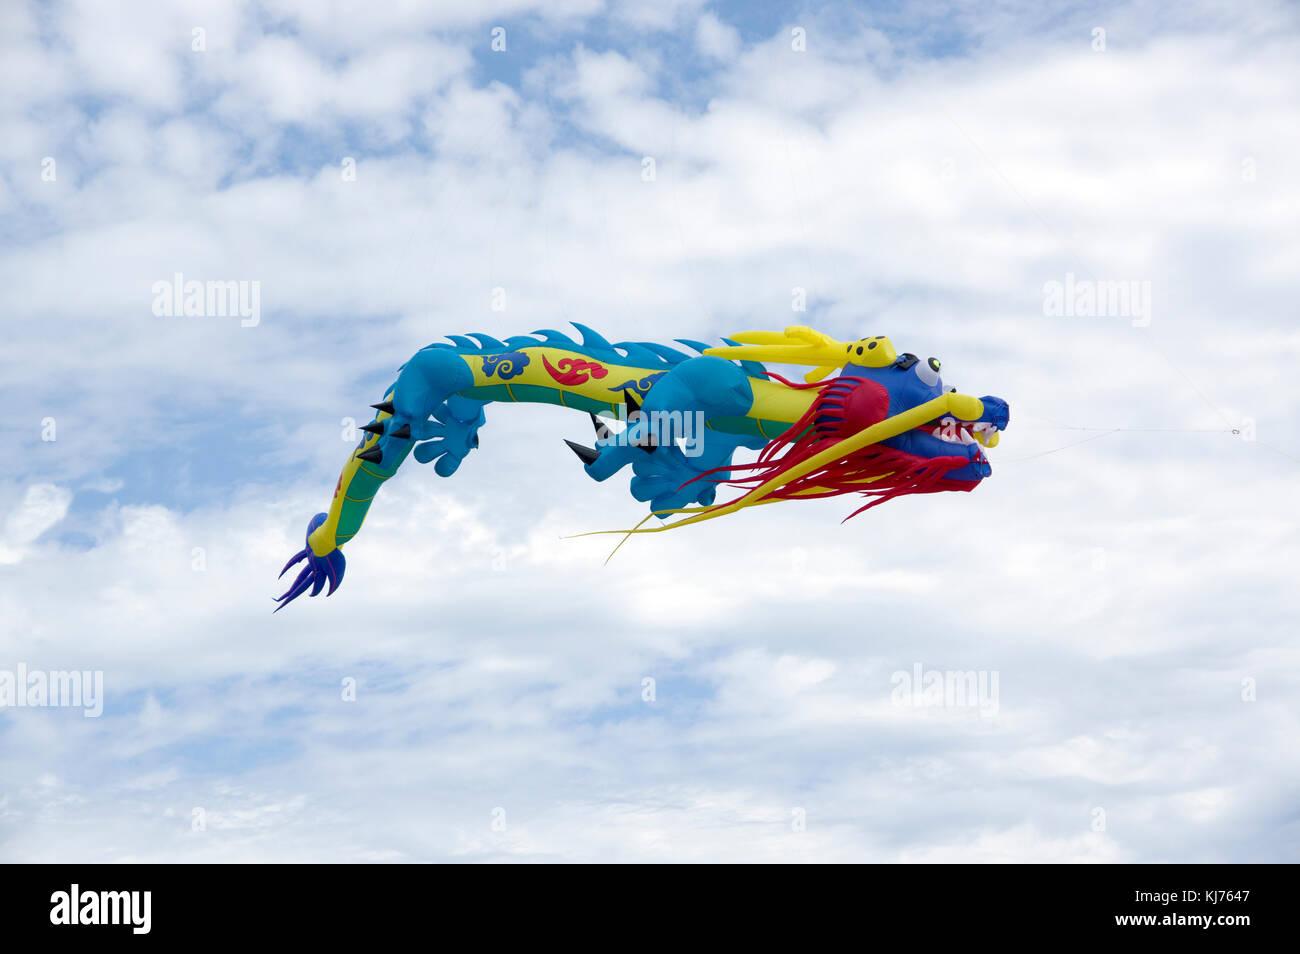 Dragon kite flying over Neshotah Beach, Two Rivers, Wisconsin during Kites Over Lake Michigan annual kite festival. - Stock Image